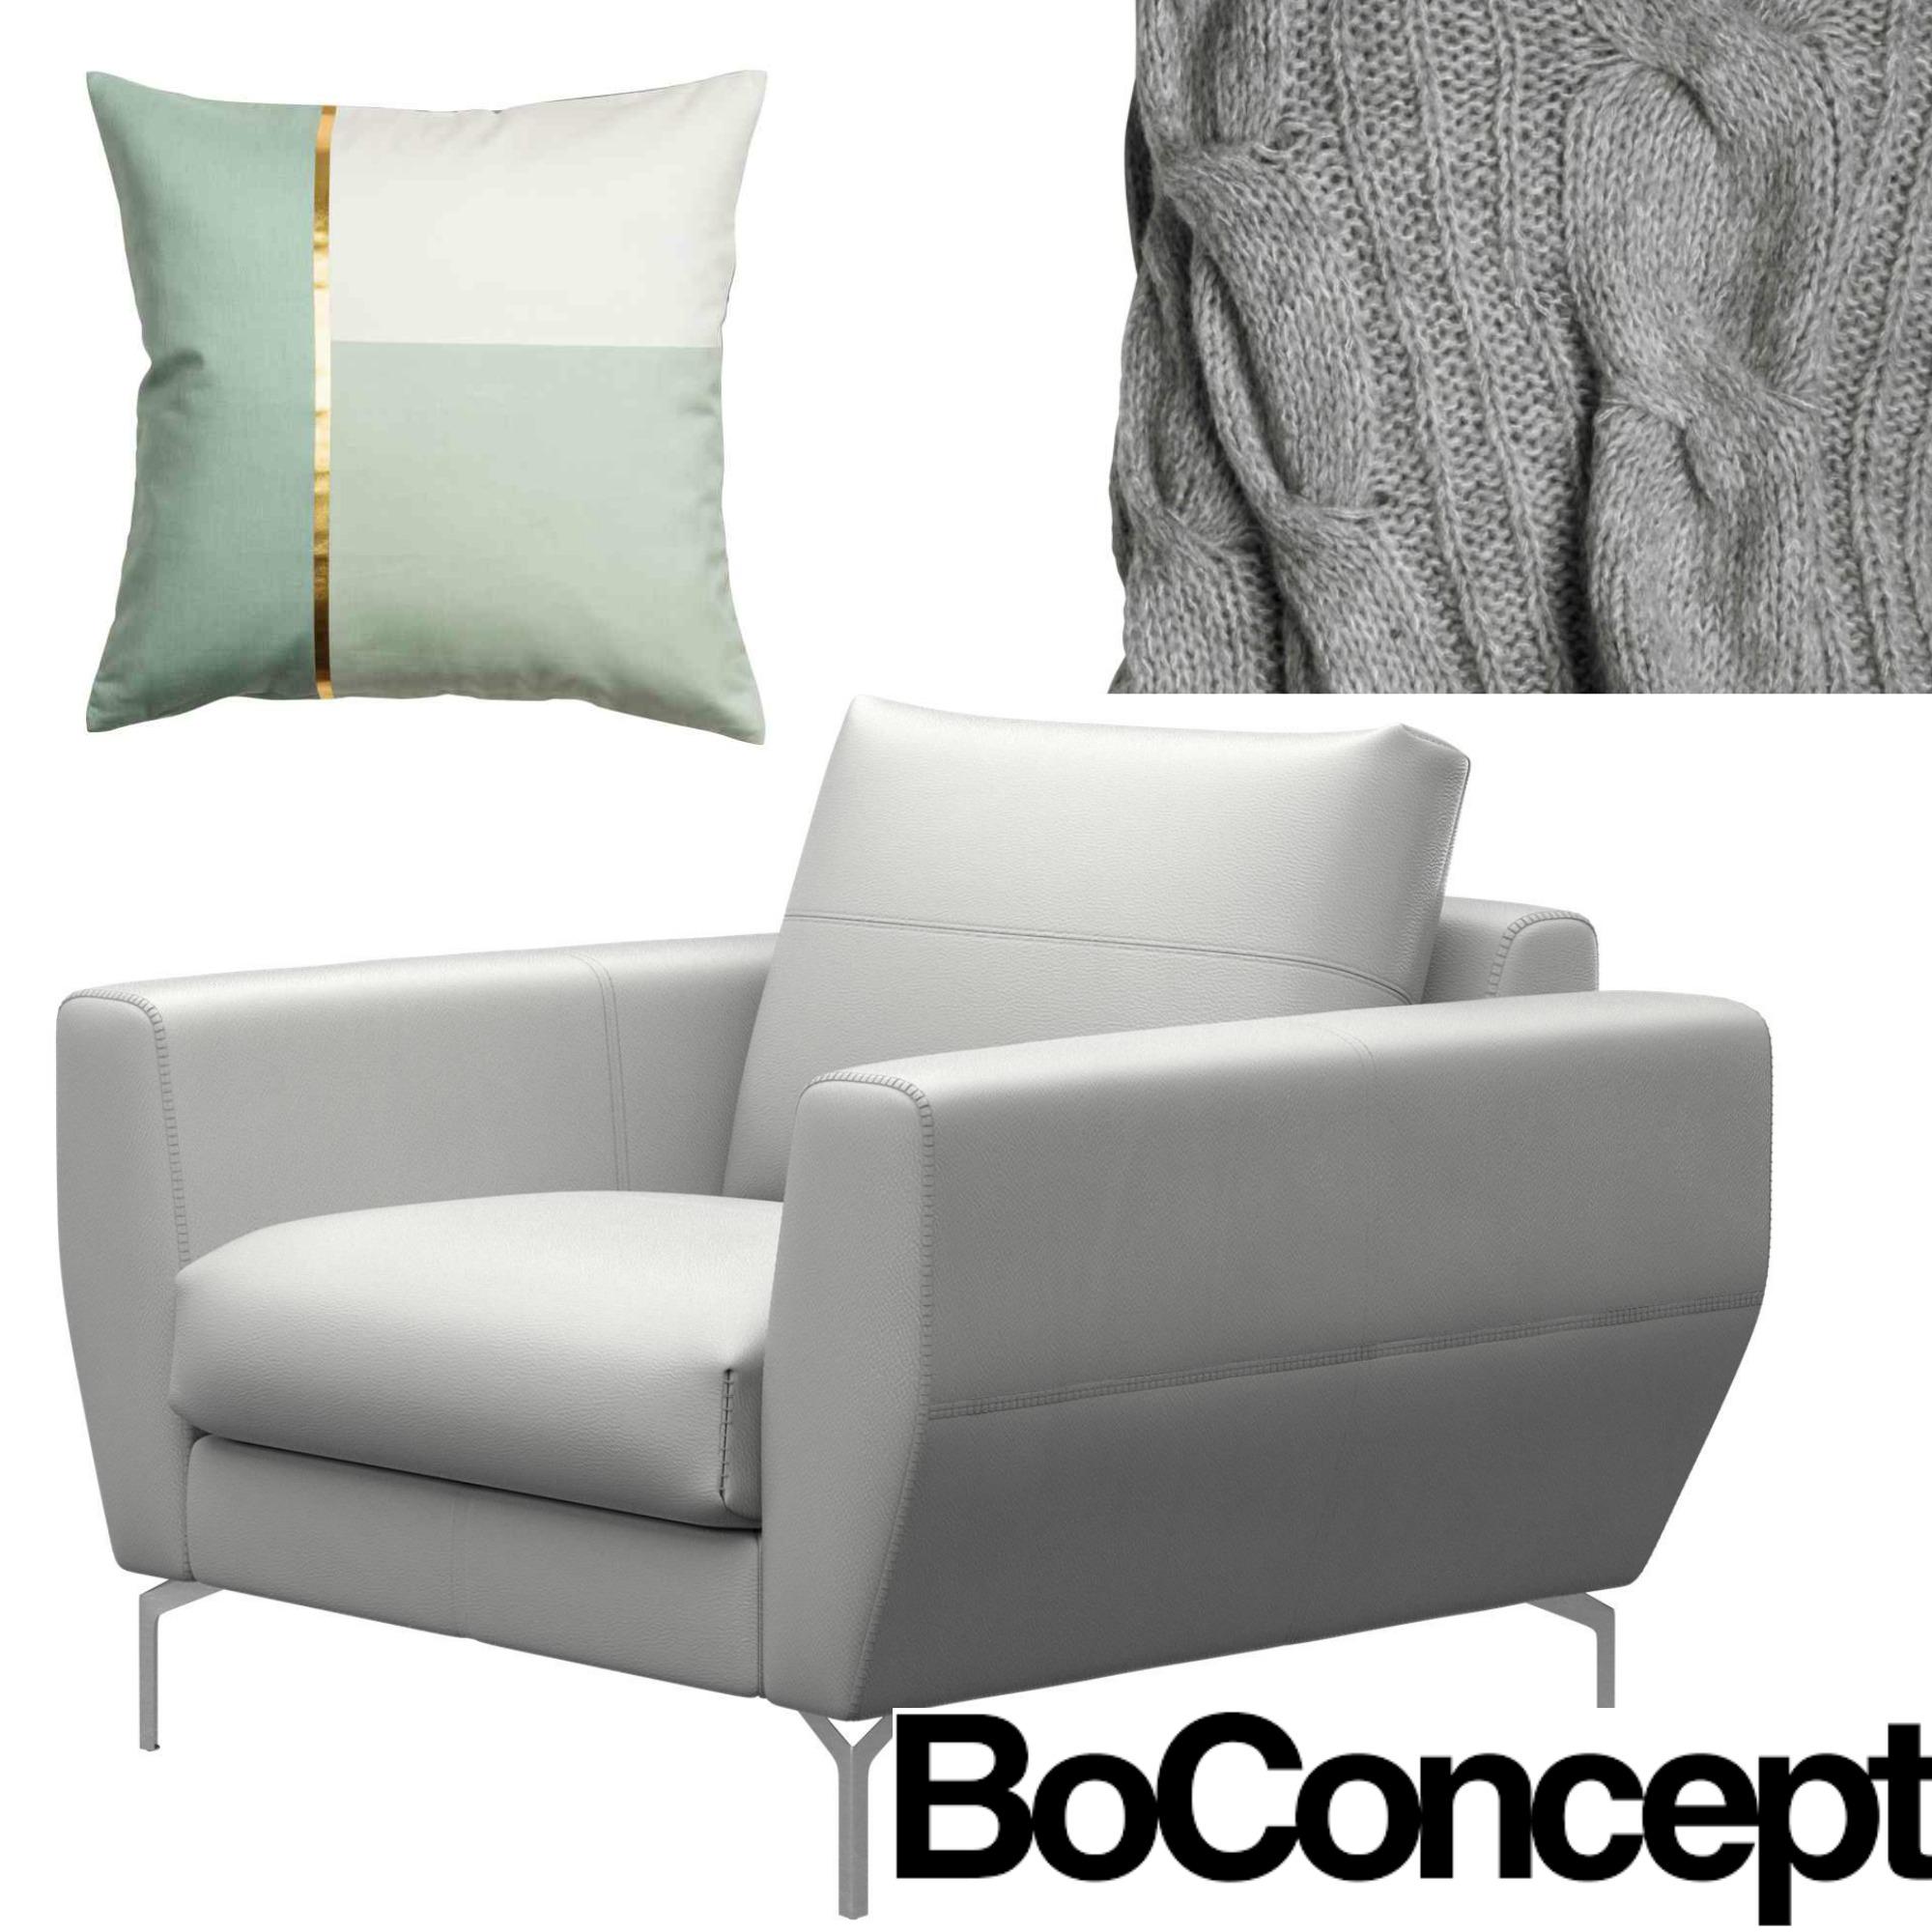 Designer Furniture Picks With BoConcept Edinburgh